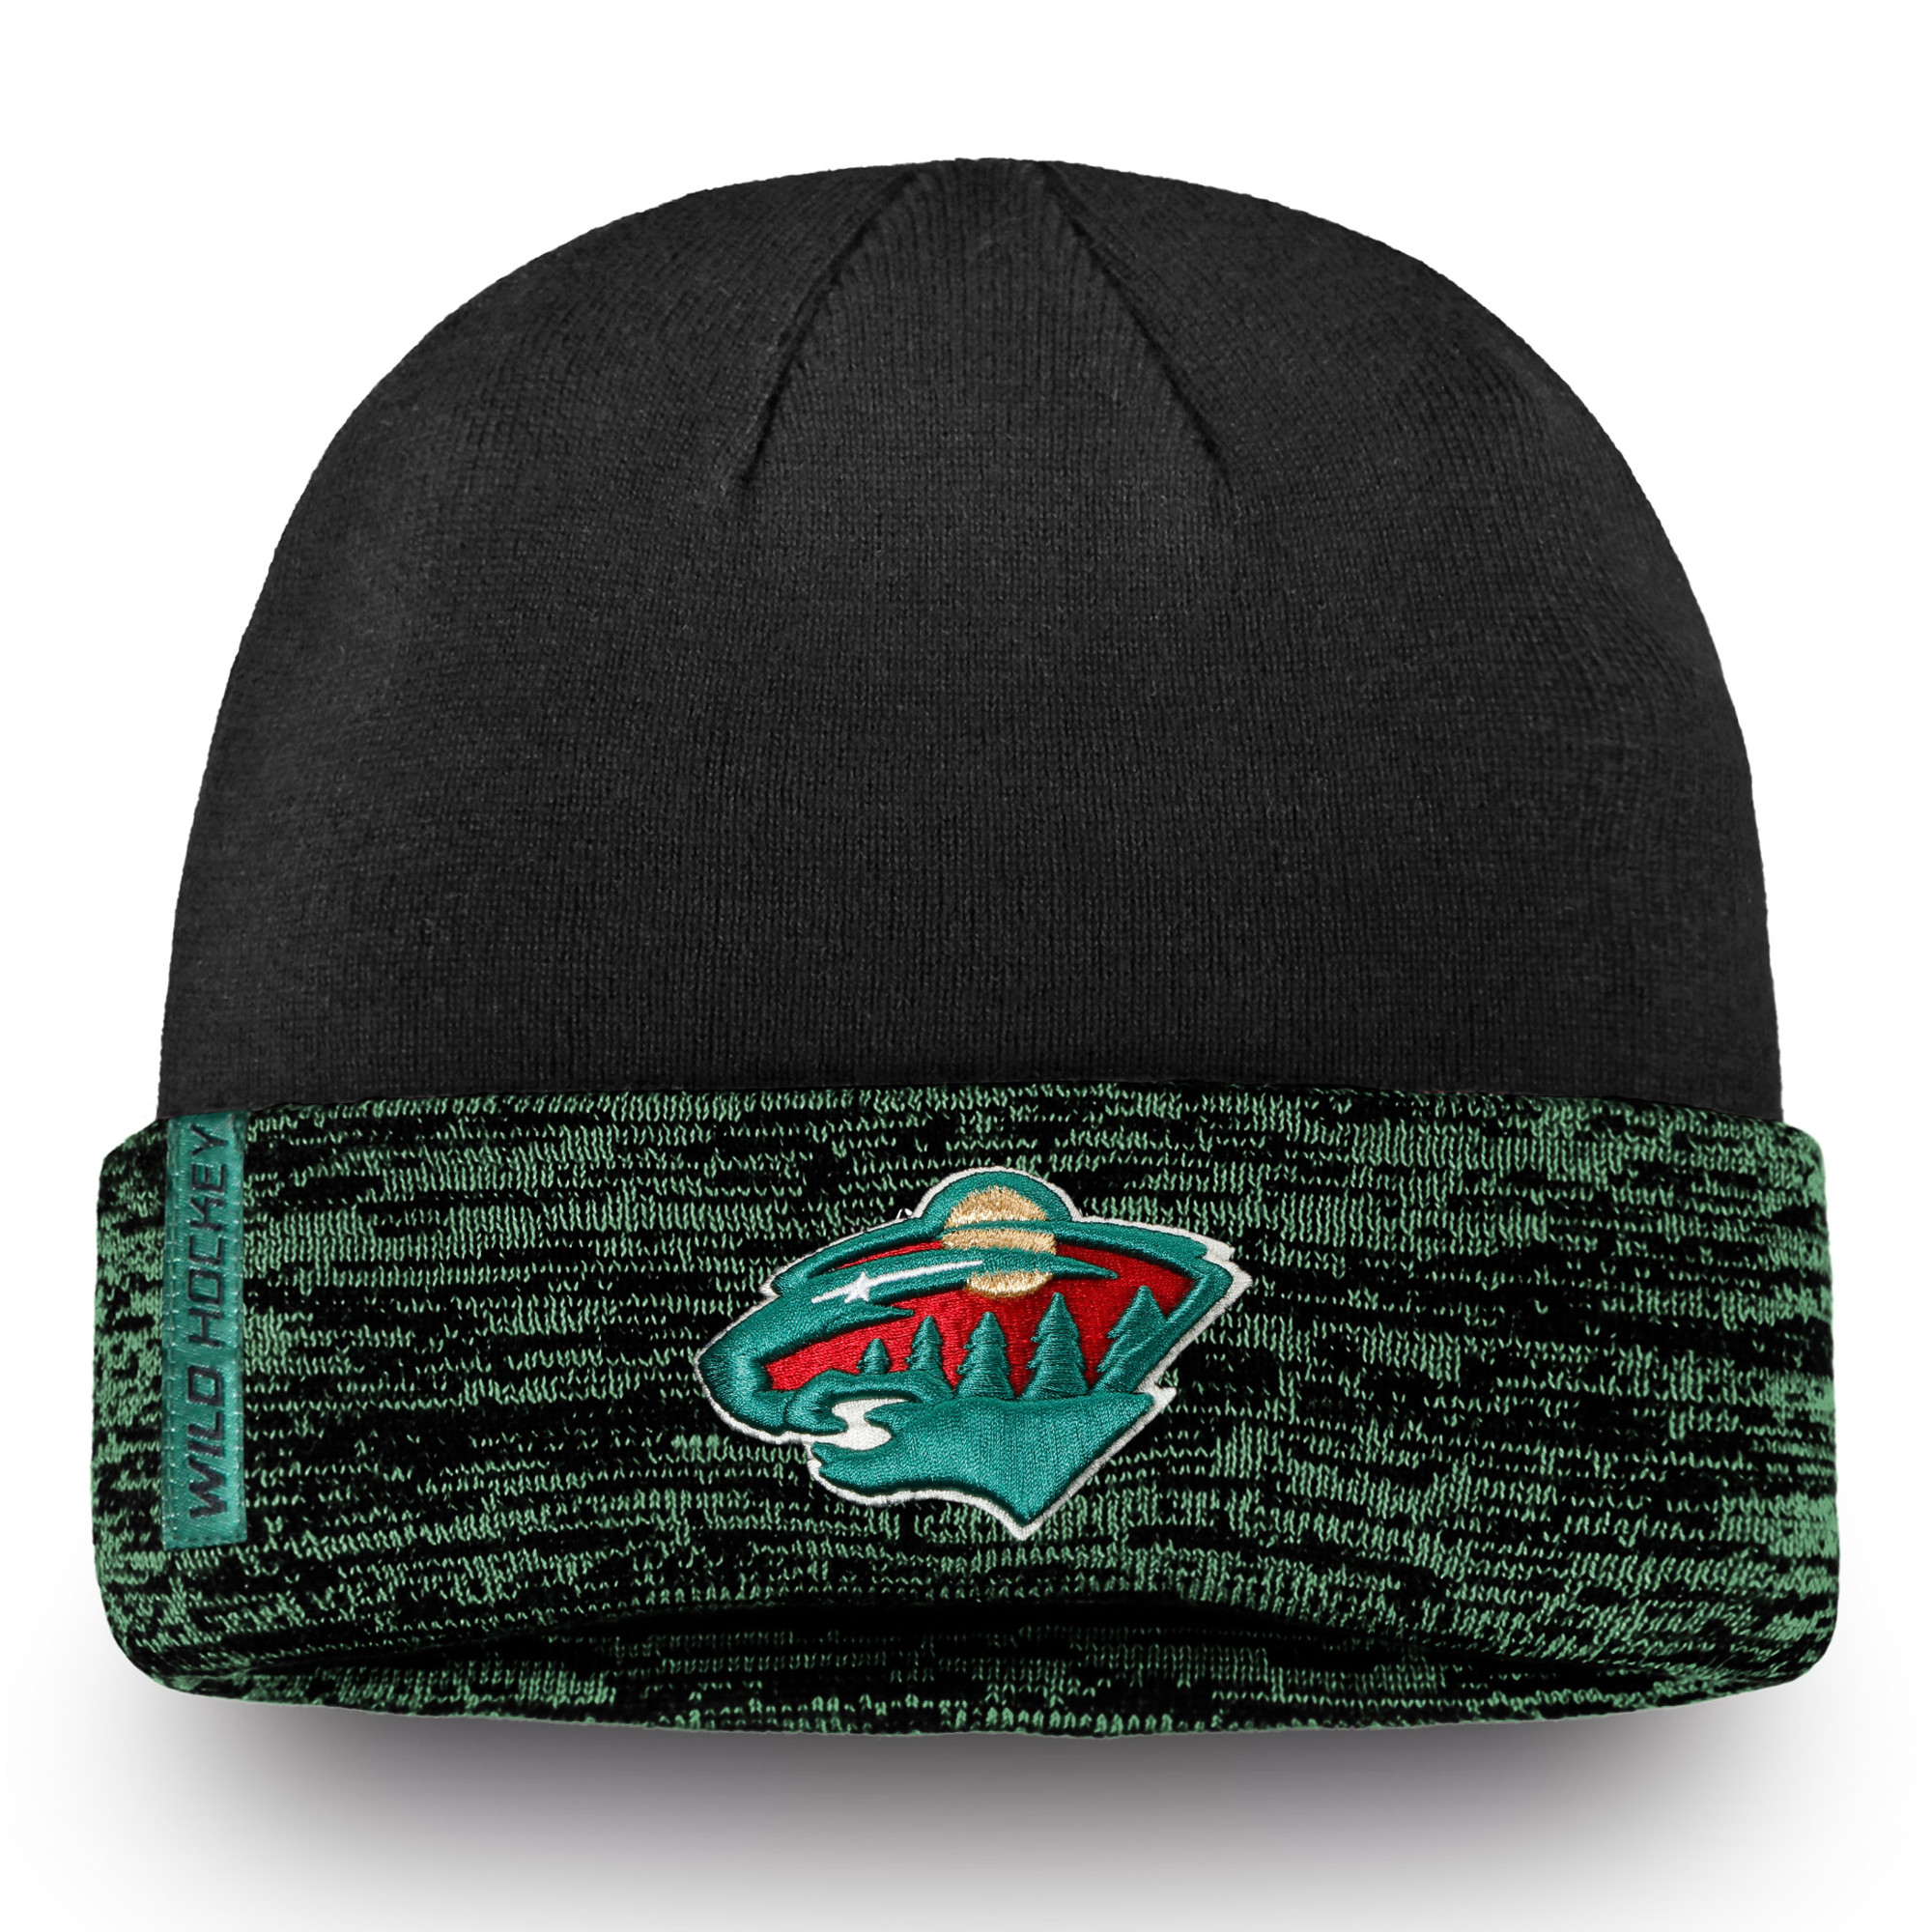 Minnesota Wild Fanatics Branded Authentic Pro Rinkside Cuffed Knit Hat - Black/Green - OSFA